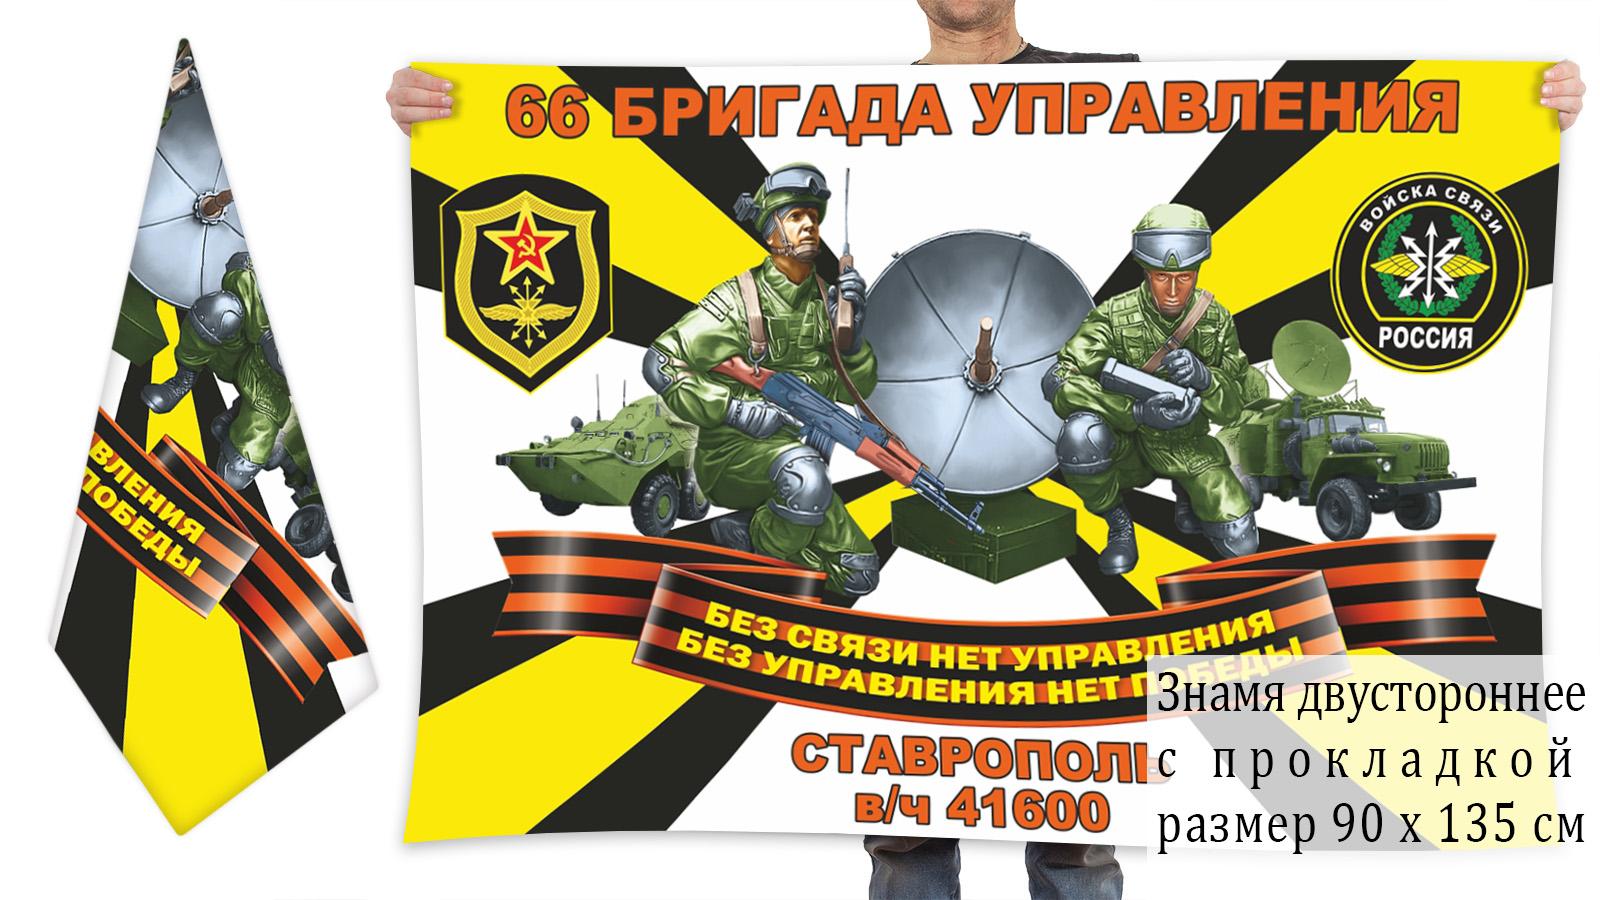 Двусторонний флаг 66 бригада управления войск связи